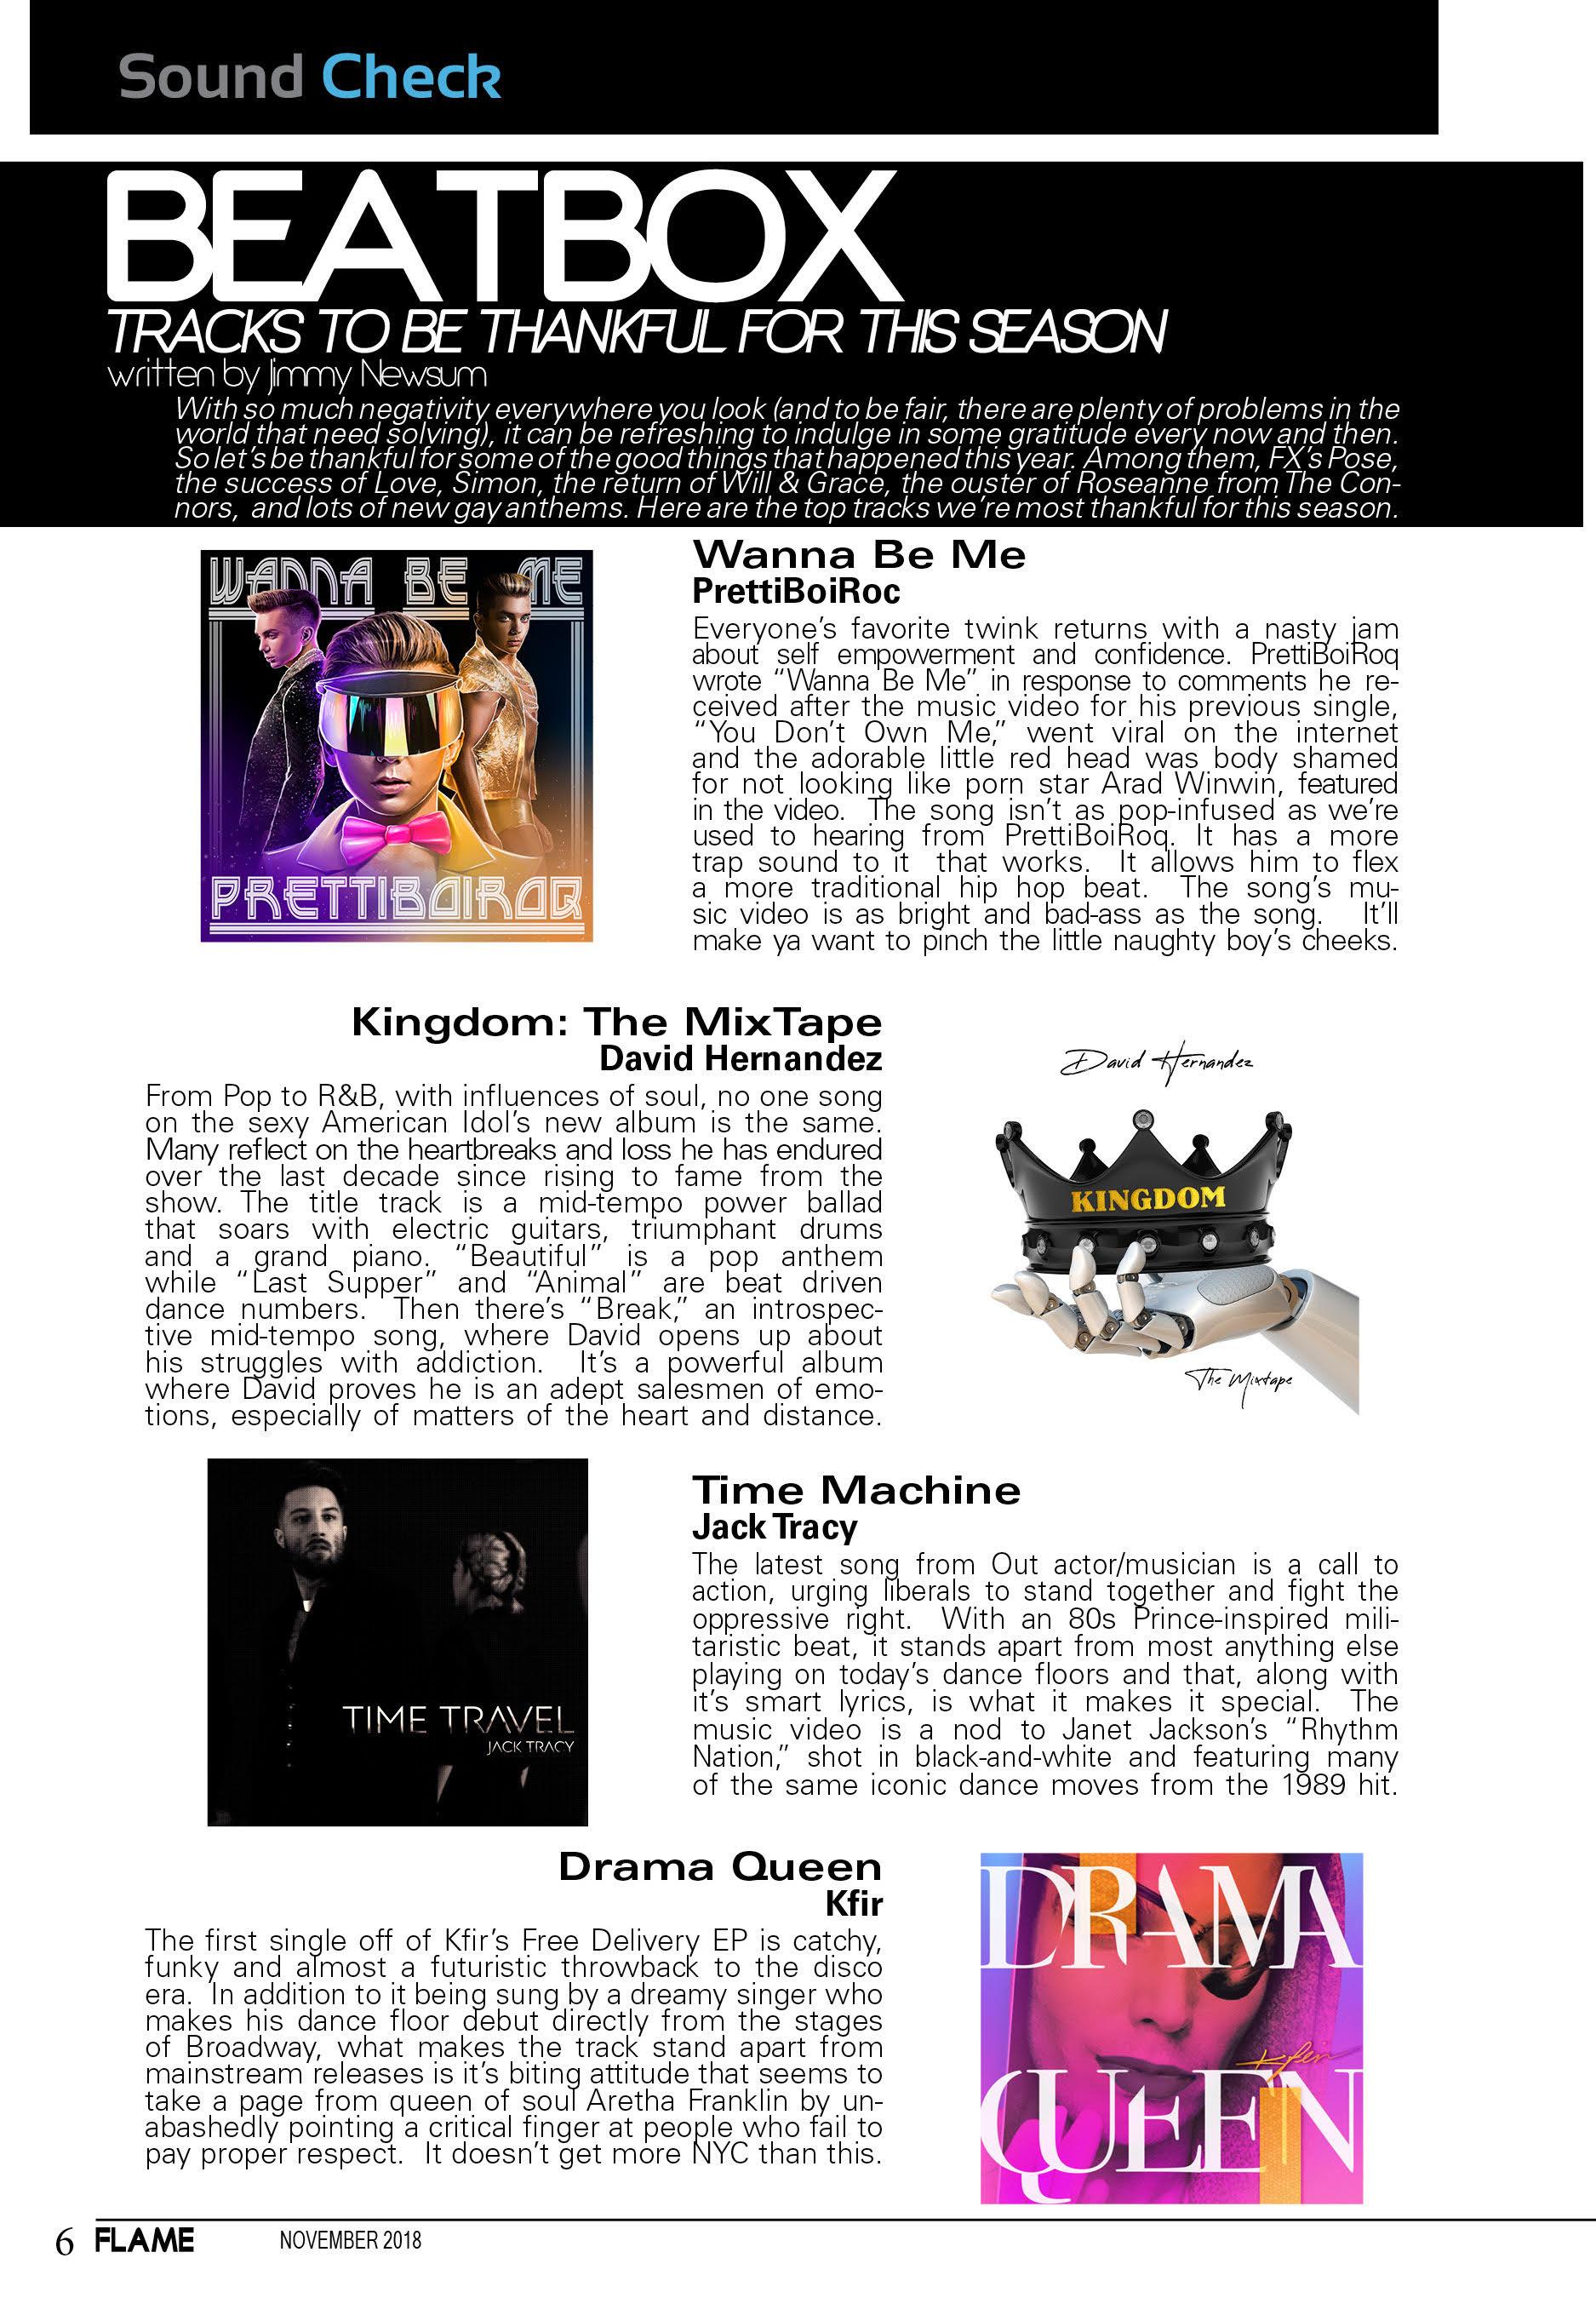 Flame Magazine - October 2018